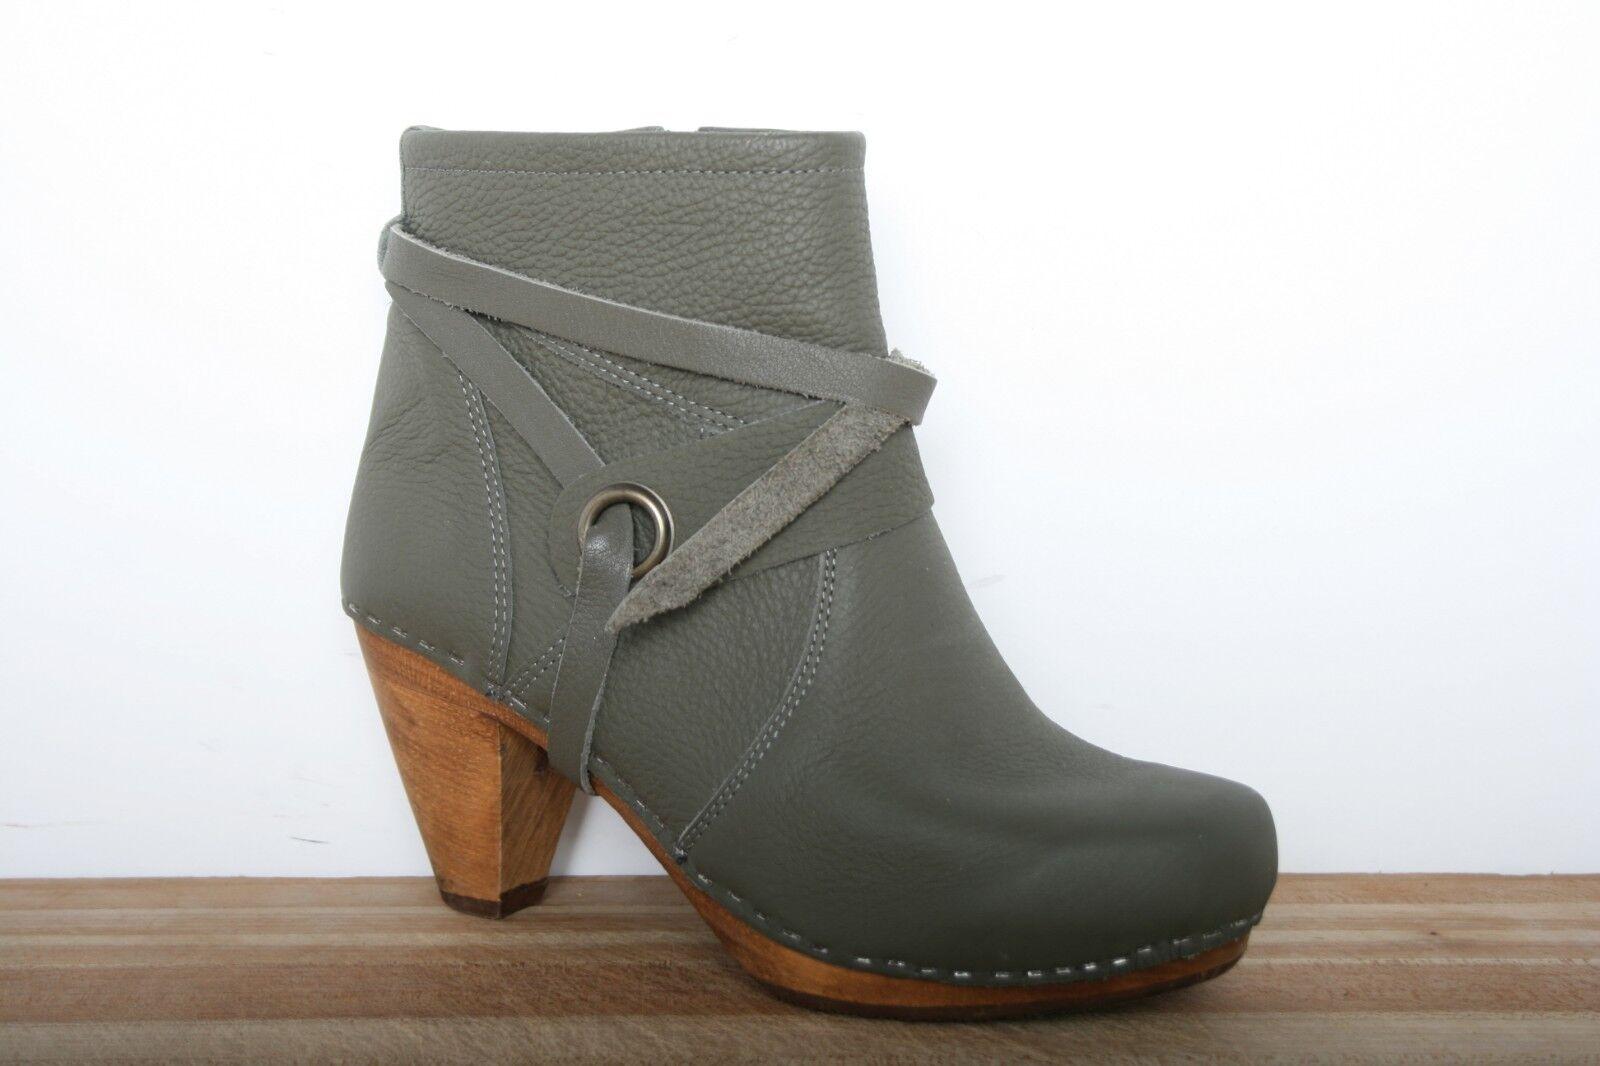 SANITA Grün Leather 3  High Ankle Wooden Heel Ankle High Stiefel Stiefelies EUR 38   US 7-7.5 fcd4ec